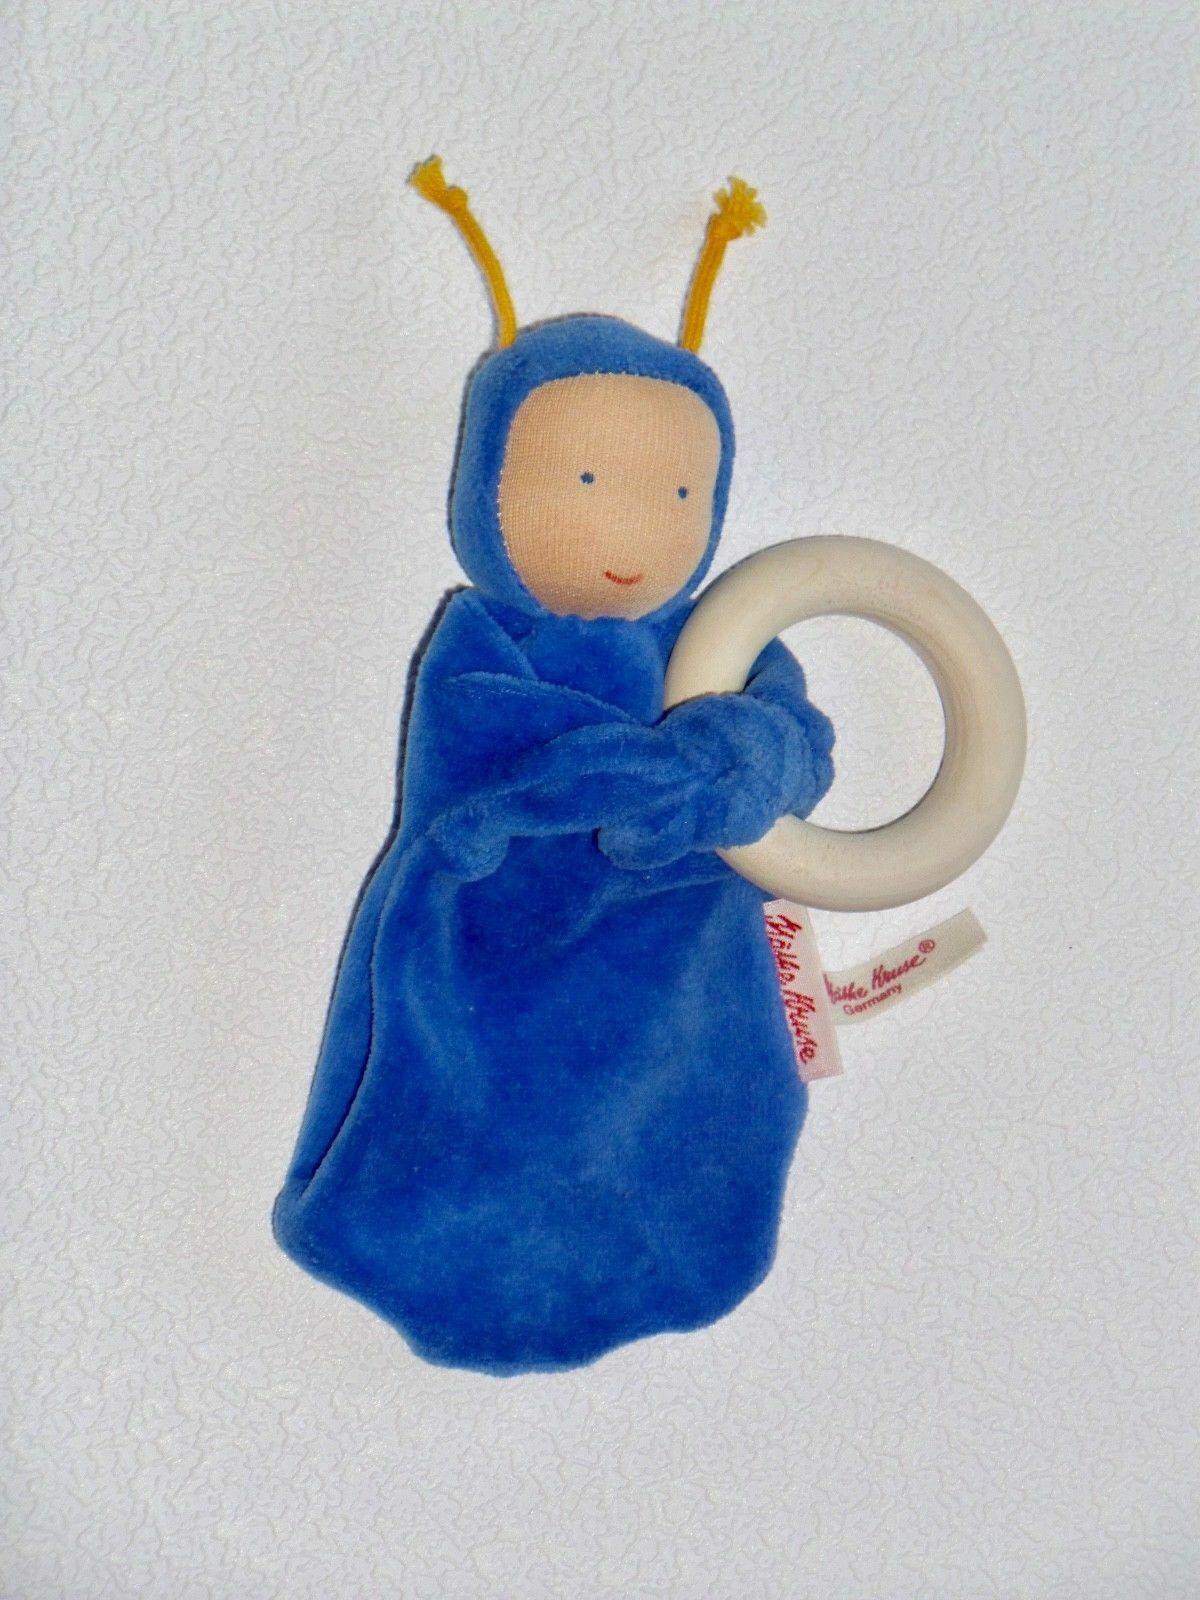 Käthe Kruse 74216 Schmusetuch Puppe Nickibaby Gelb Neu /& Ovp